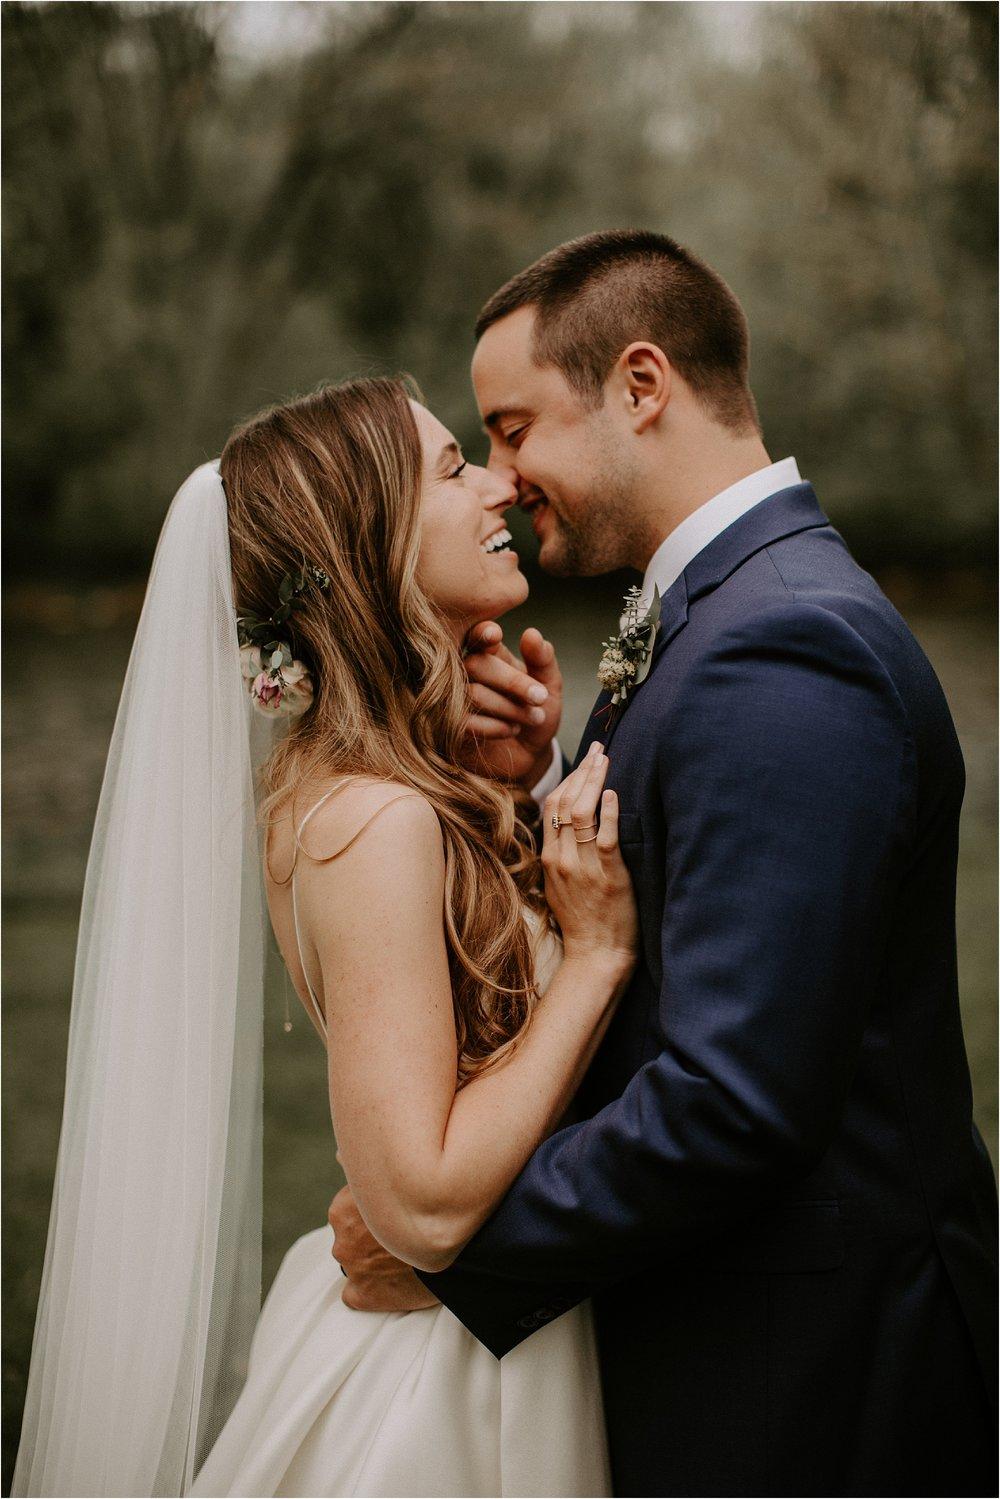 Sarah_Brookhart_Lancaster_PA_Wedding_Photographer_0056.jpg